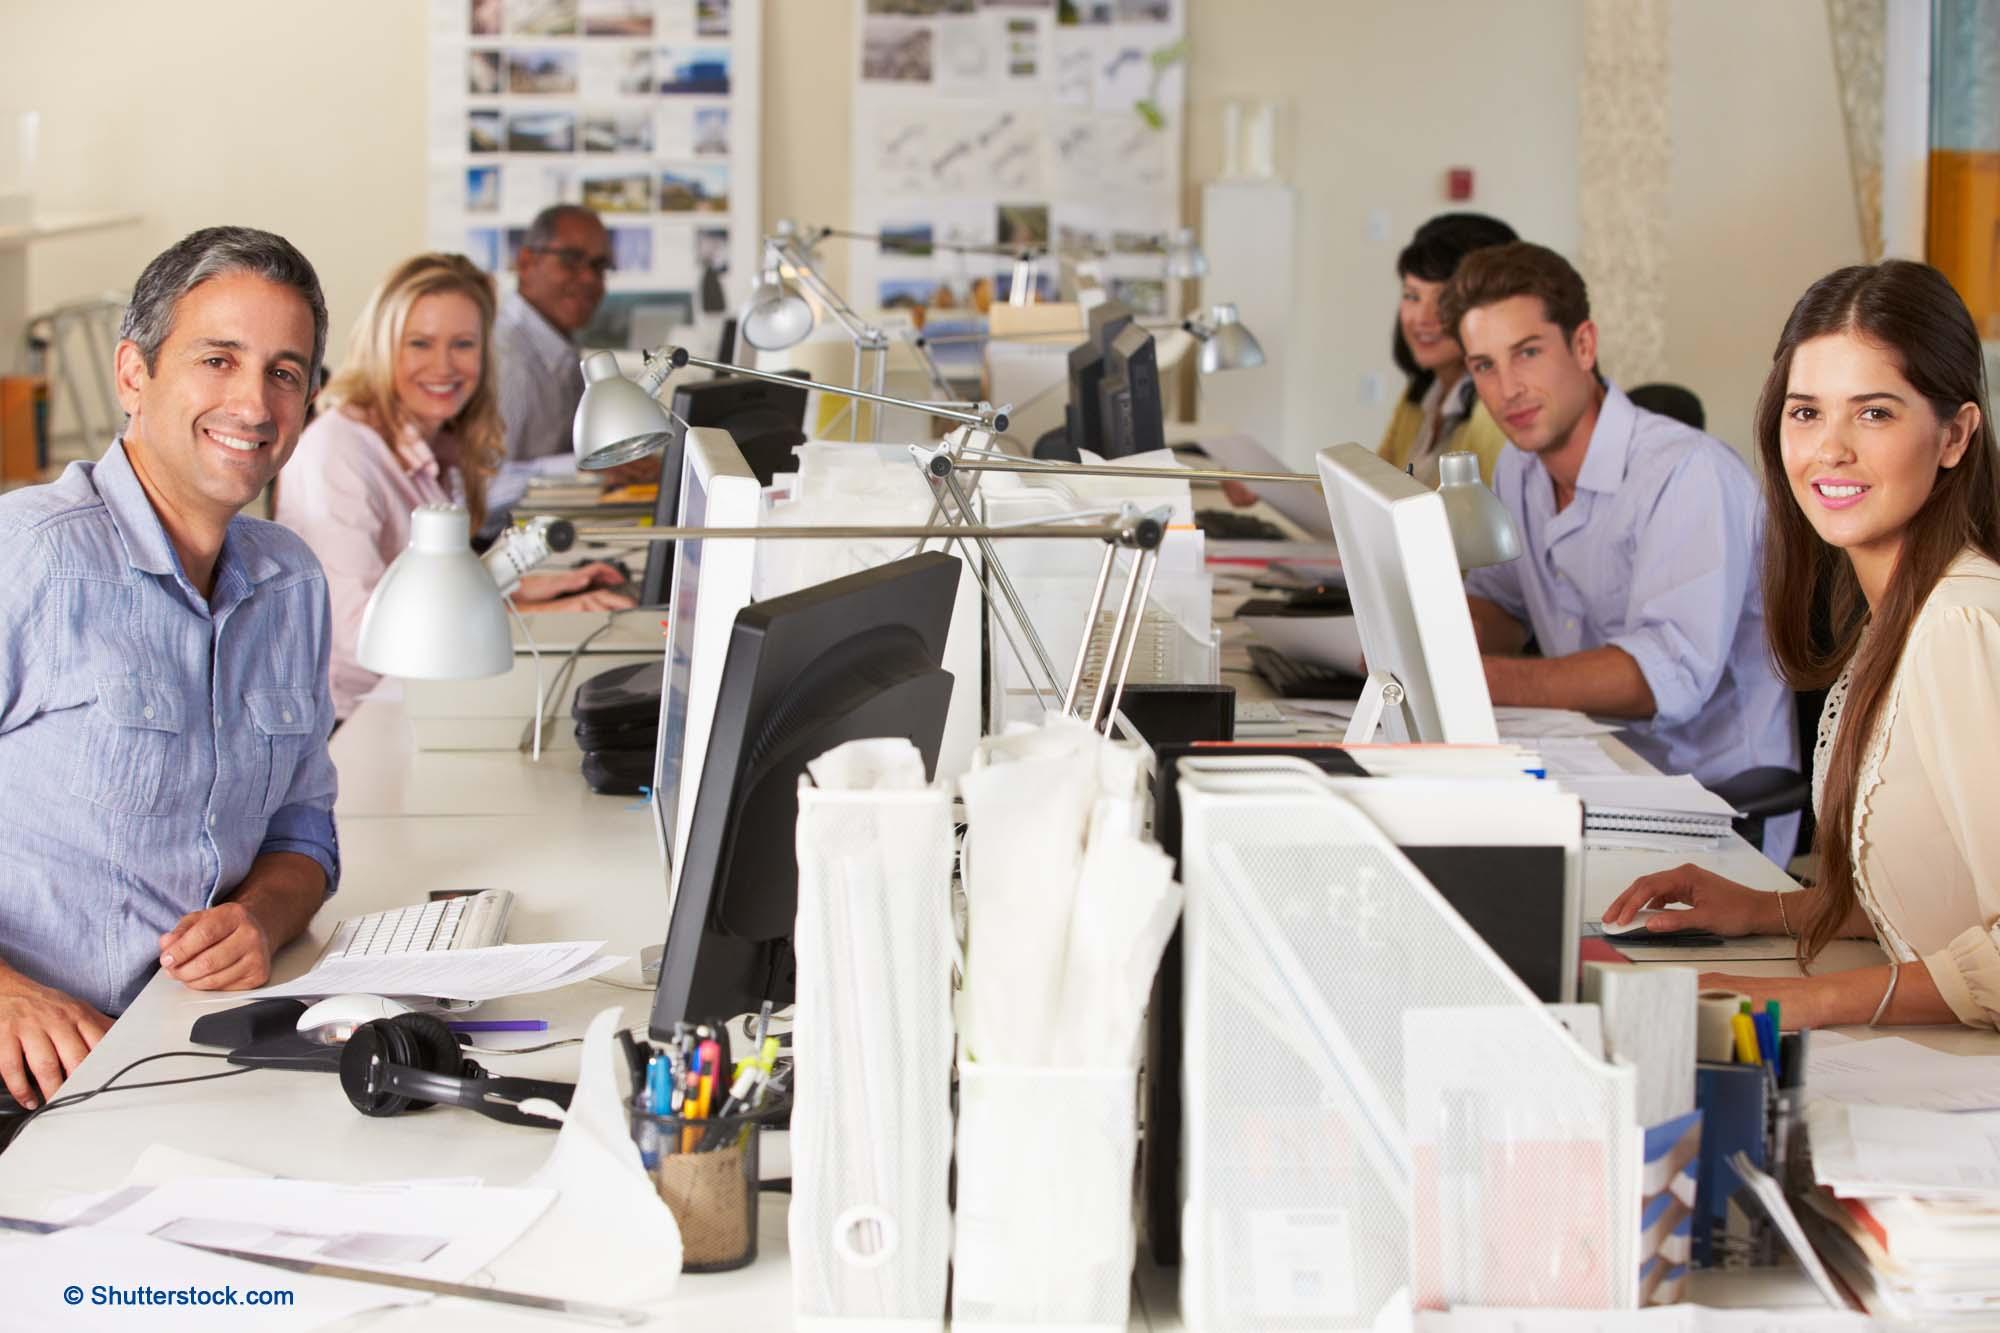 Workplace Photo